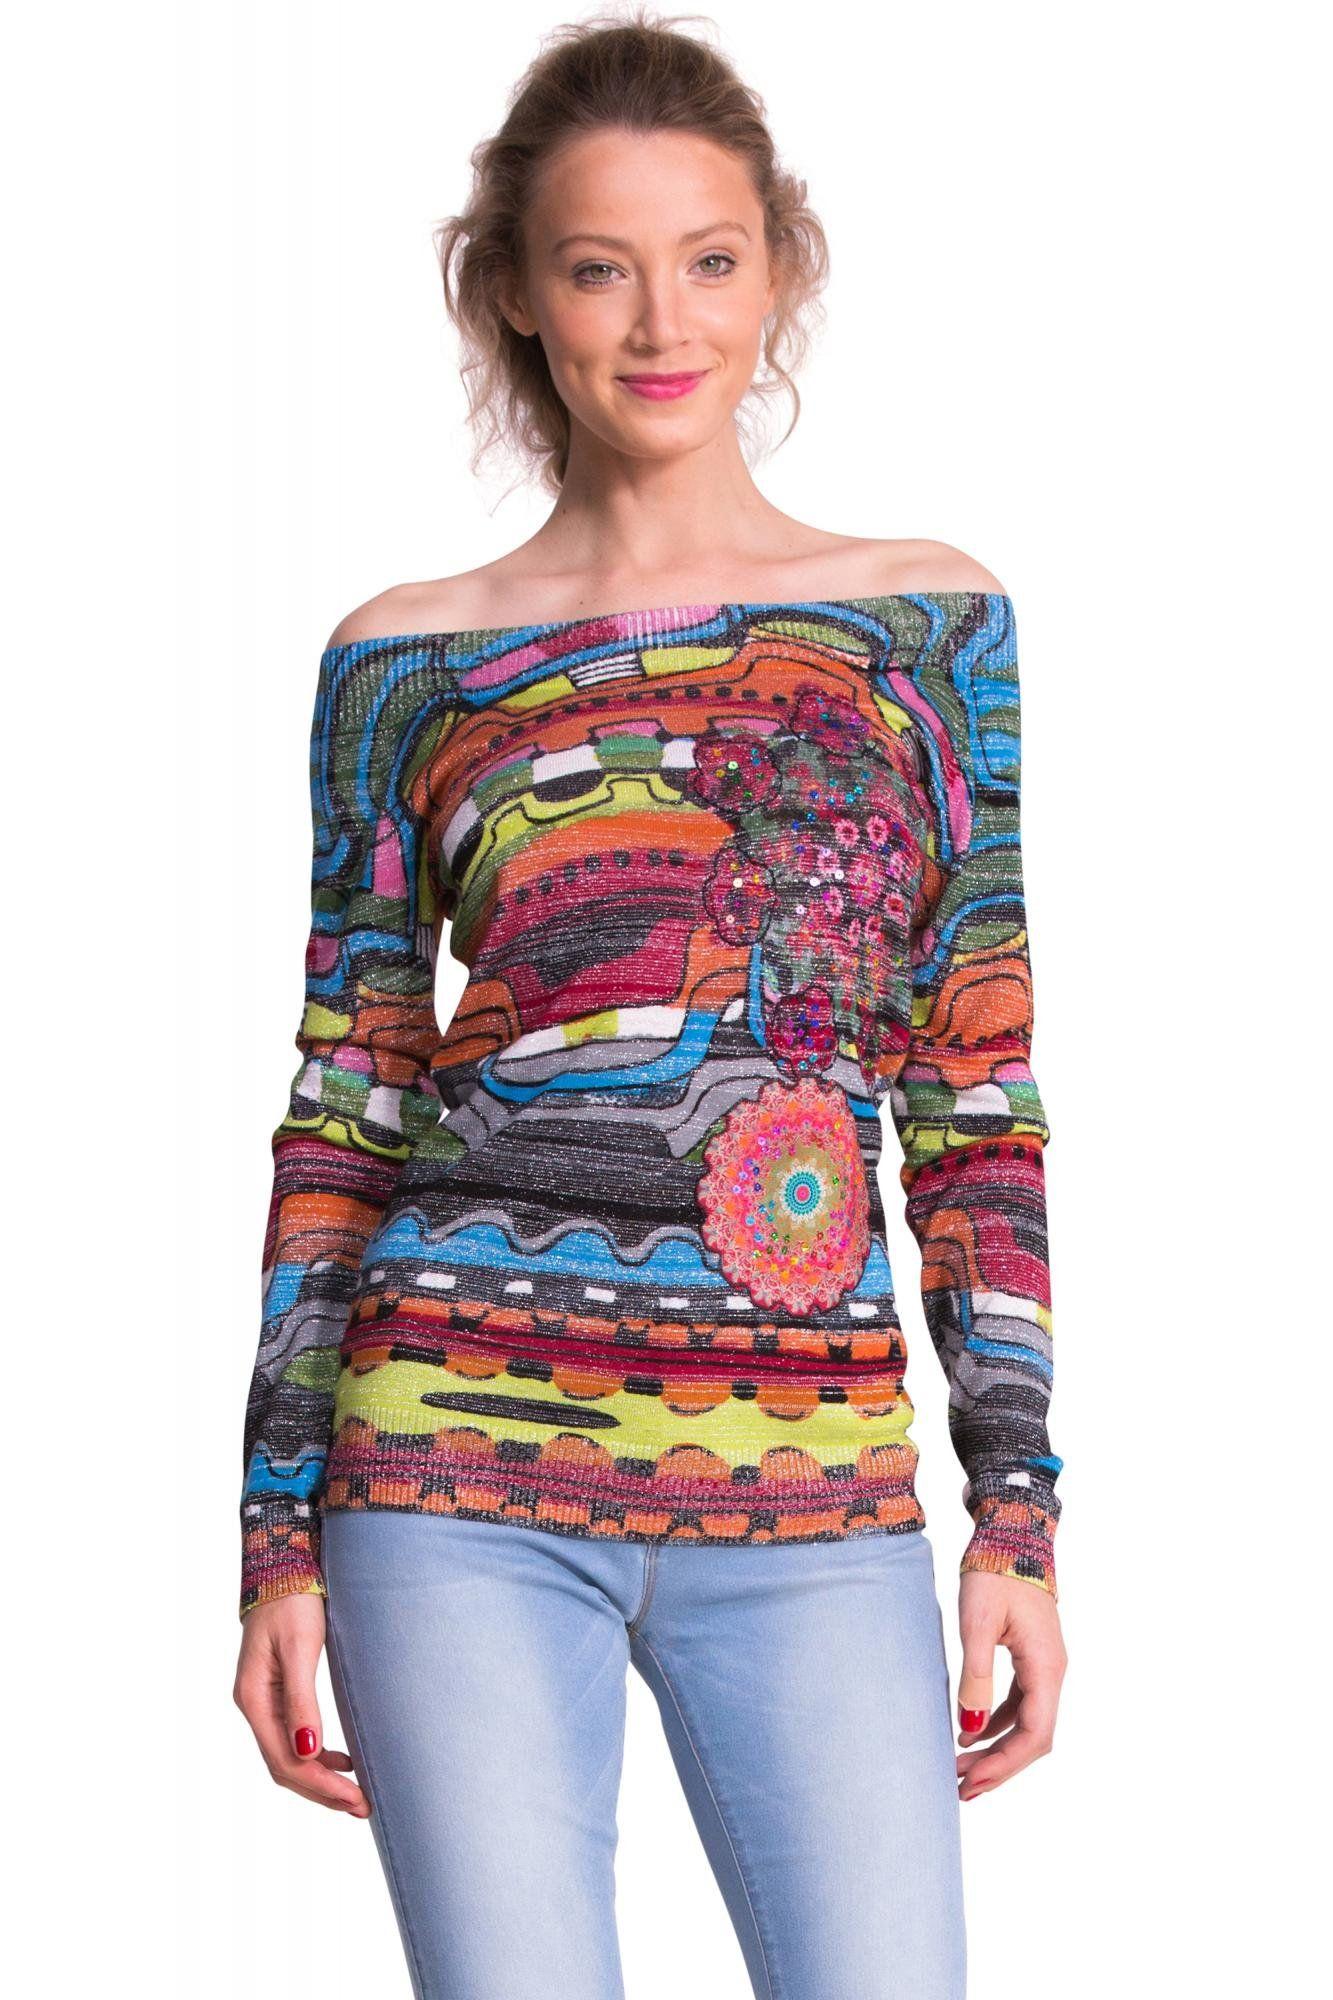 eea7f288b9a Desigual Sweater Fiesta